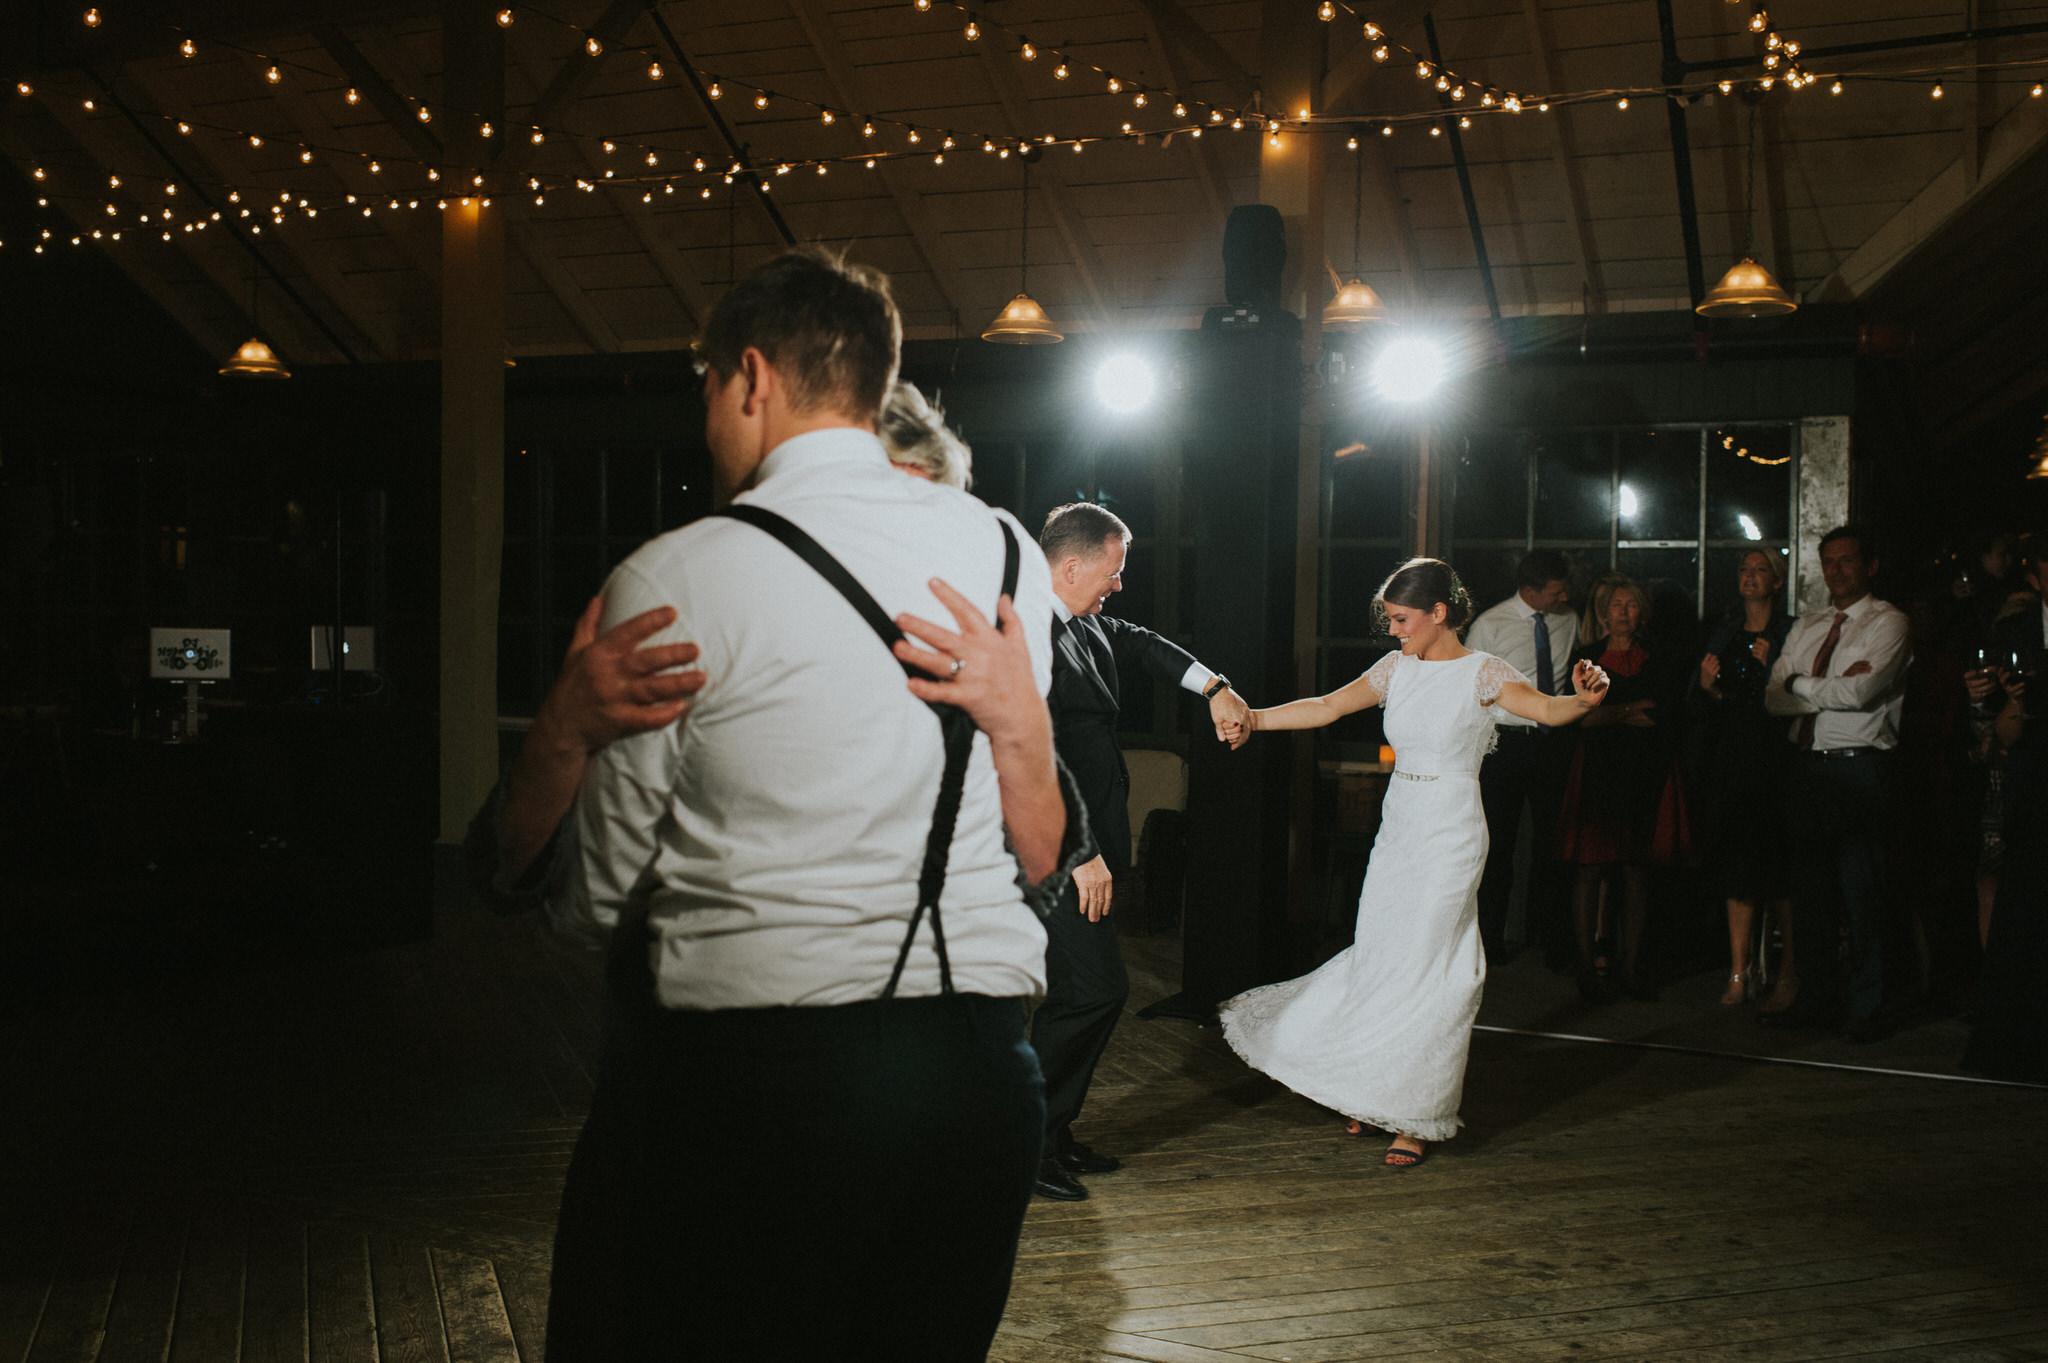 scarletoneillphotography_weddingphotography_prince edward county weddings176.JPG